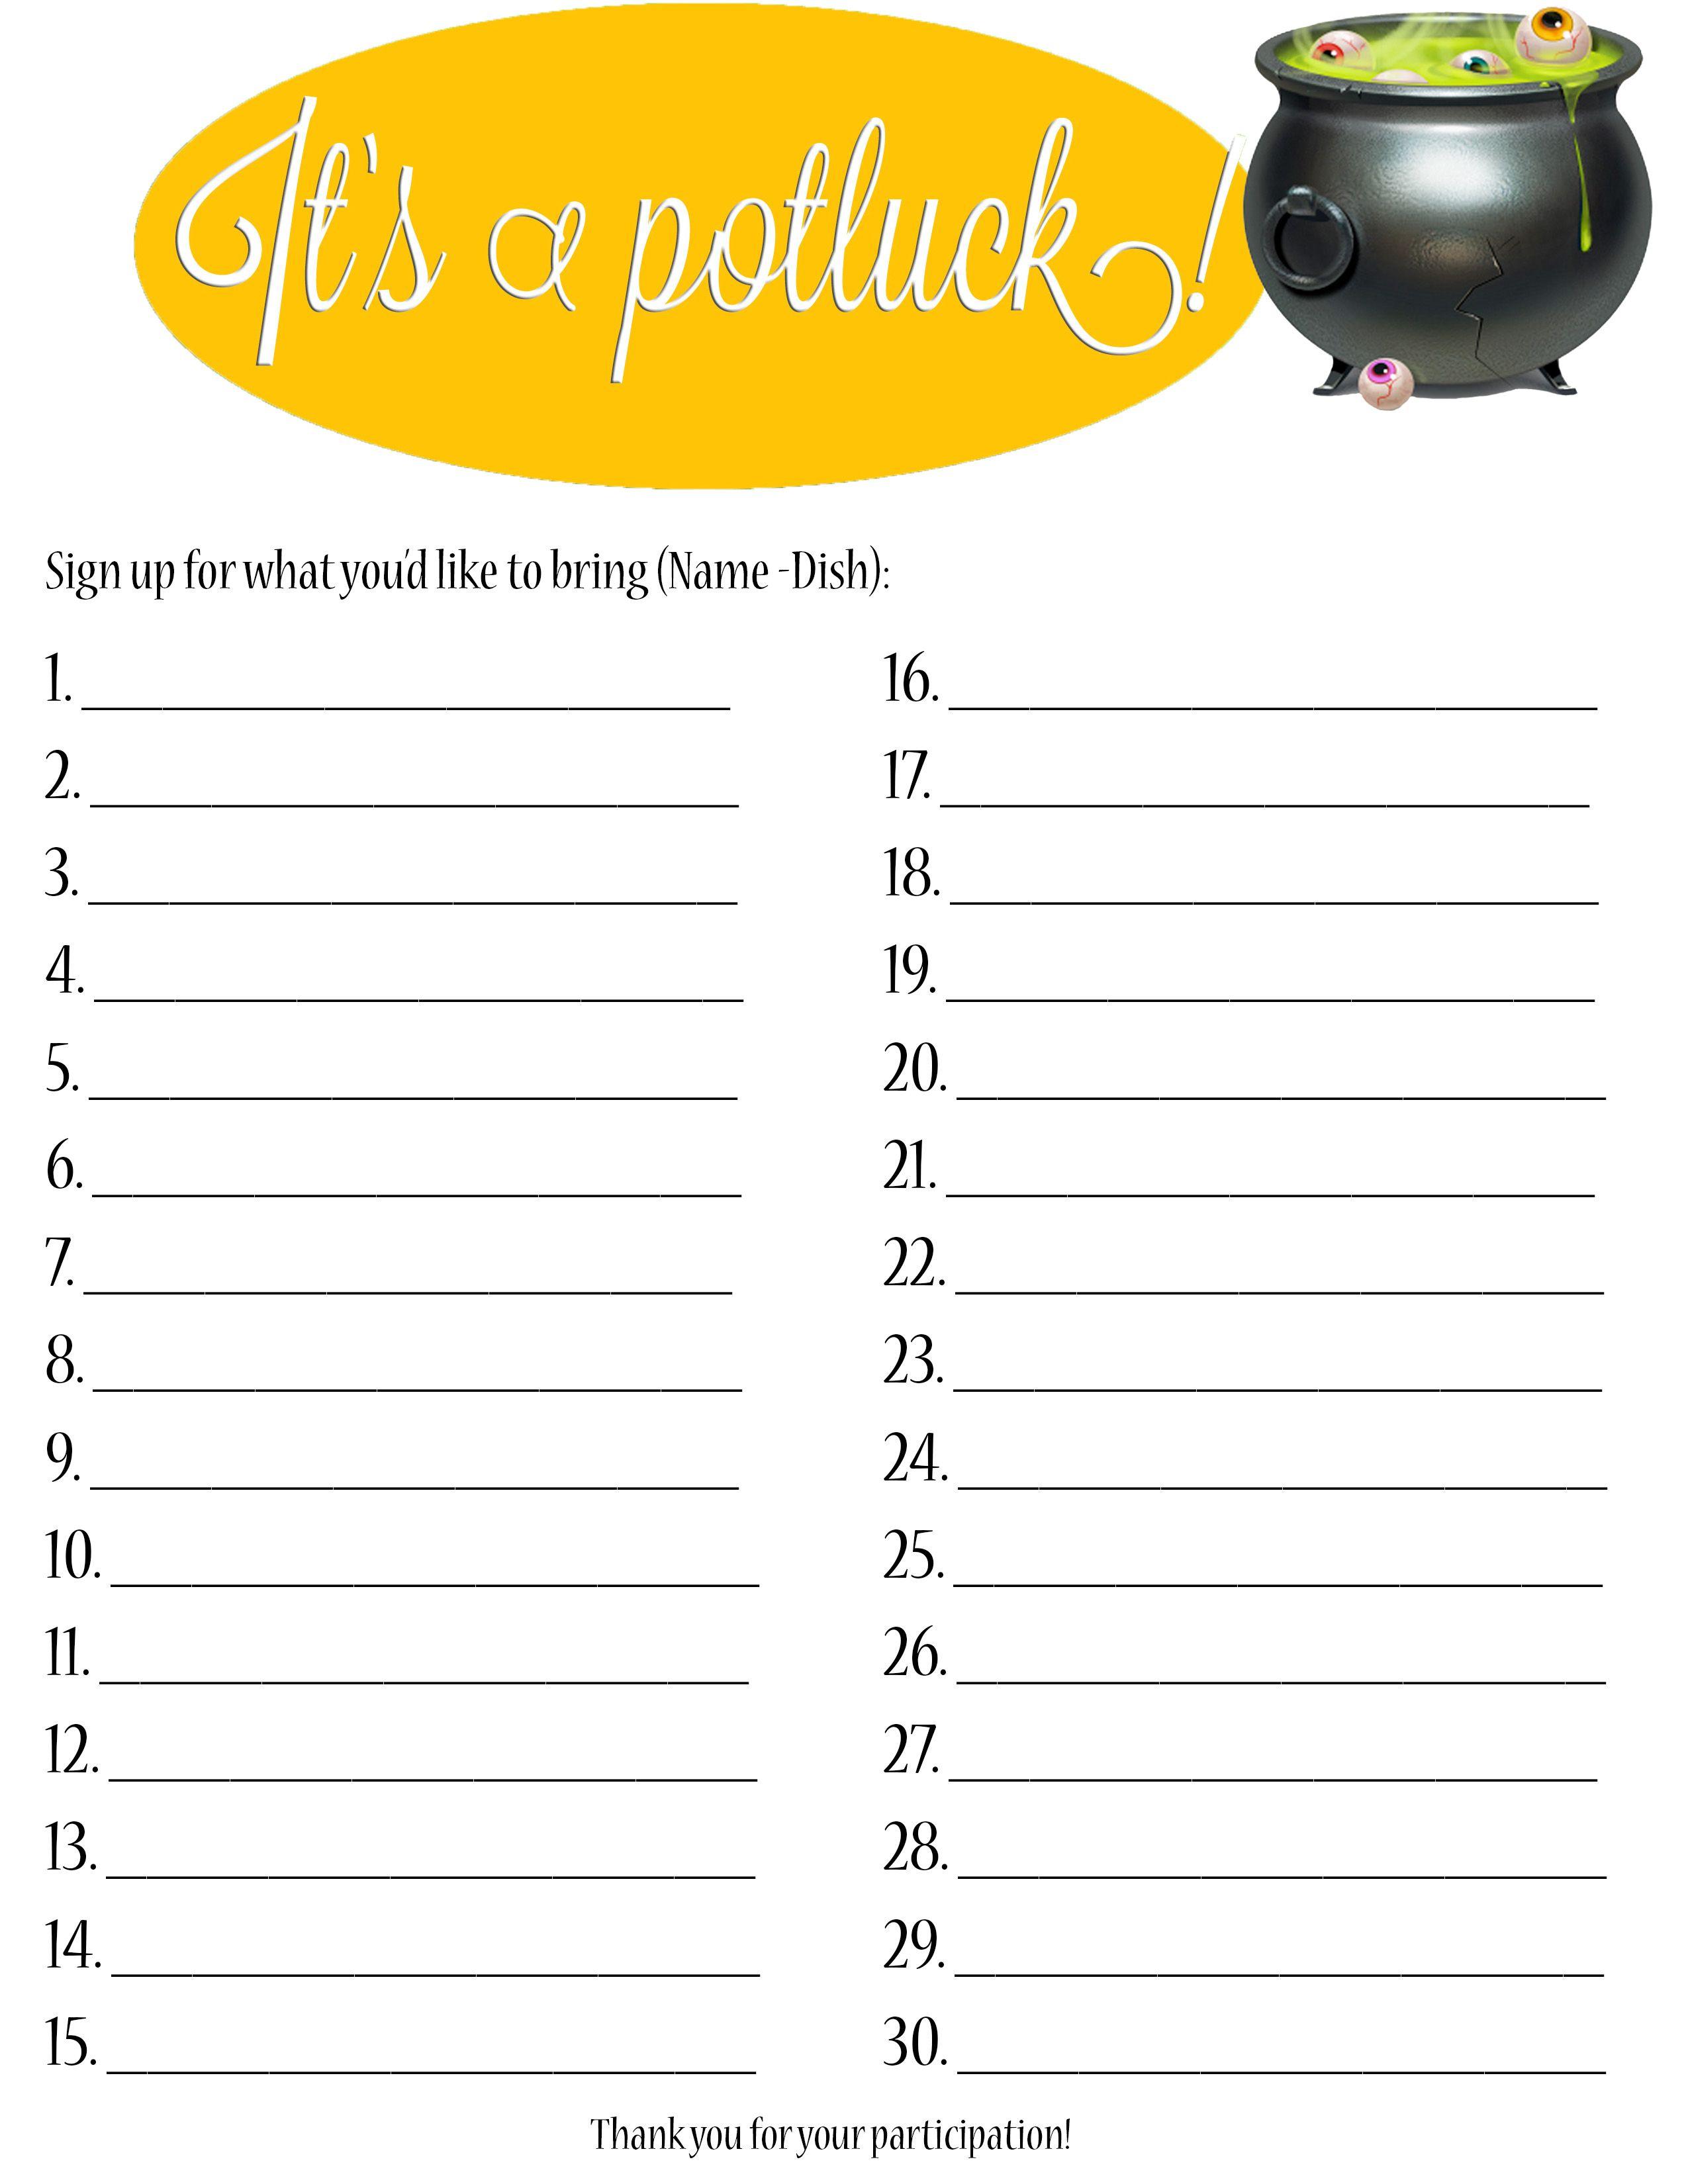 Halloween sign up sheet. Cauldron clipart potluck